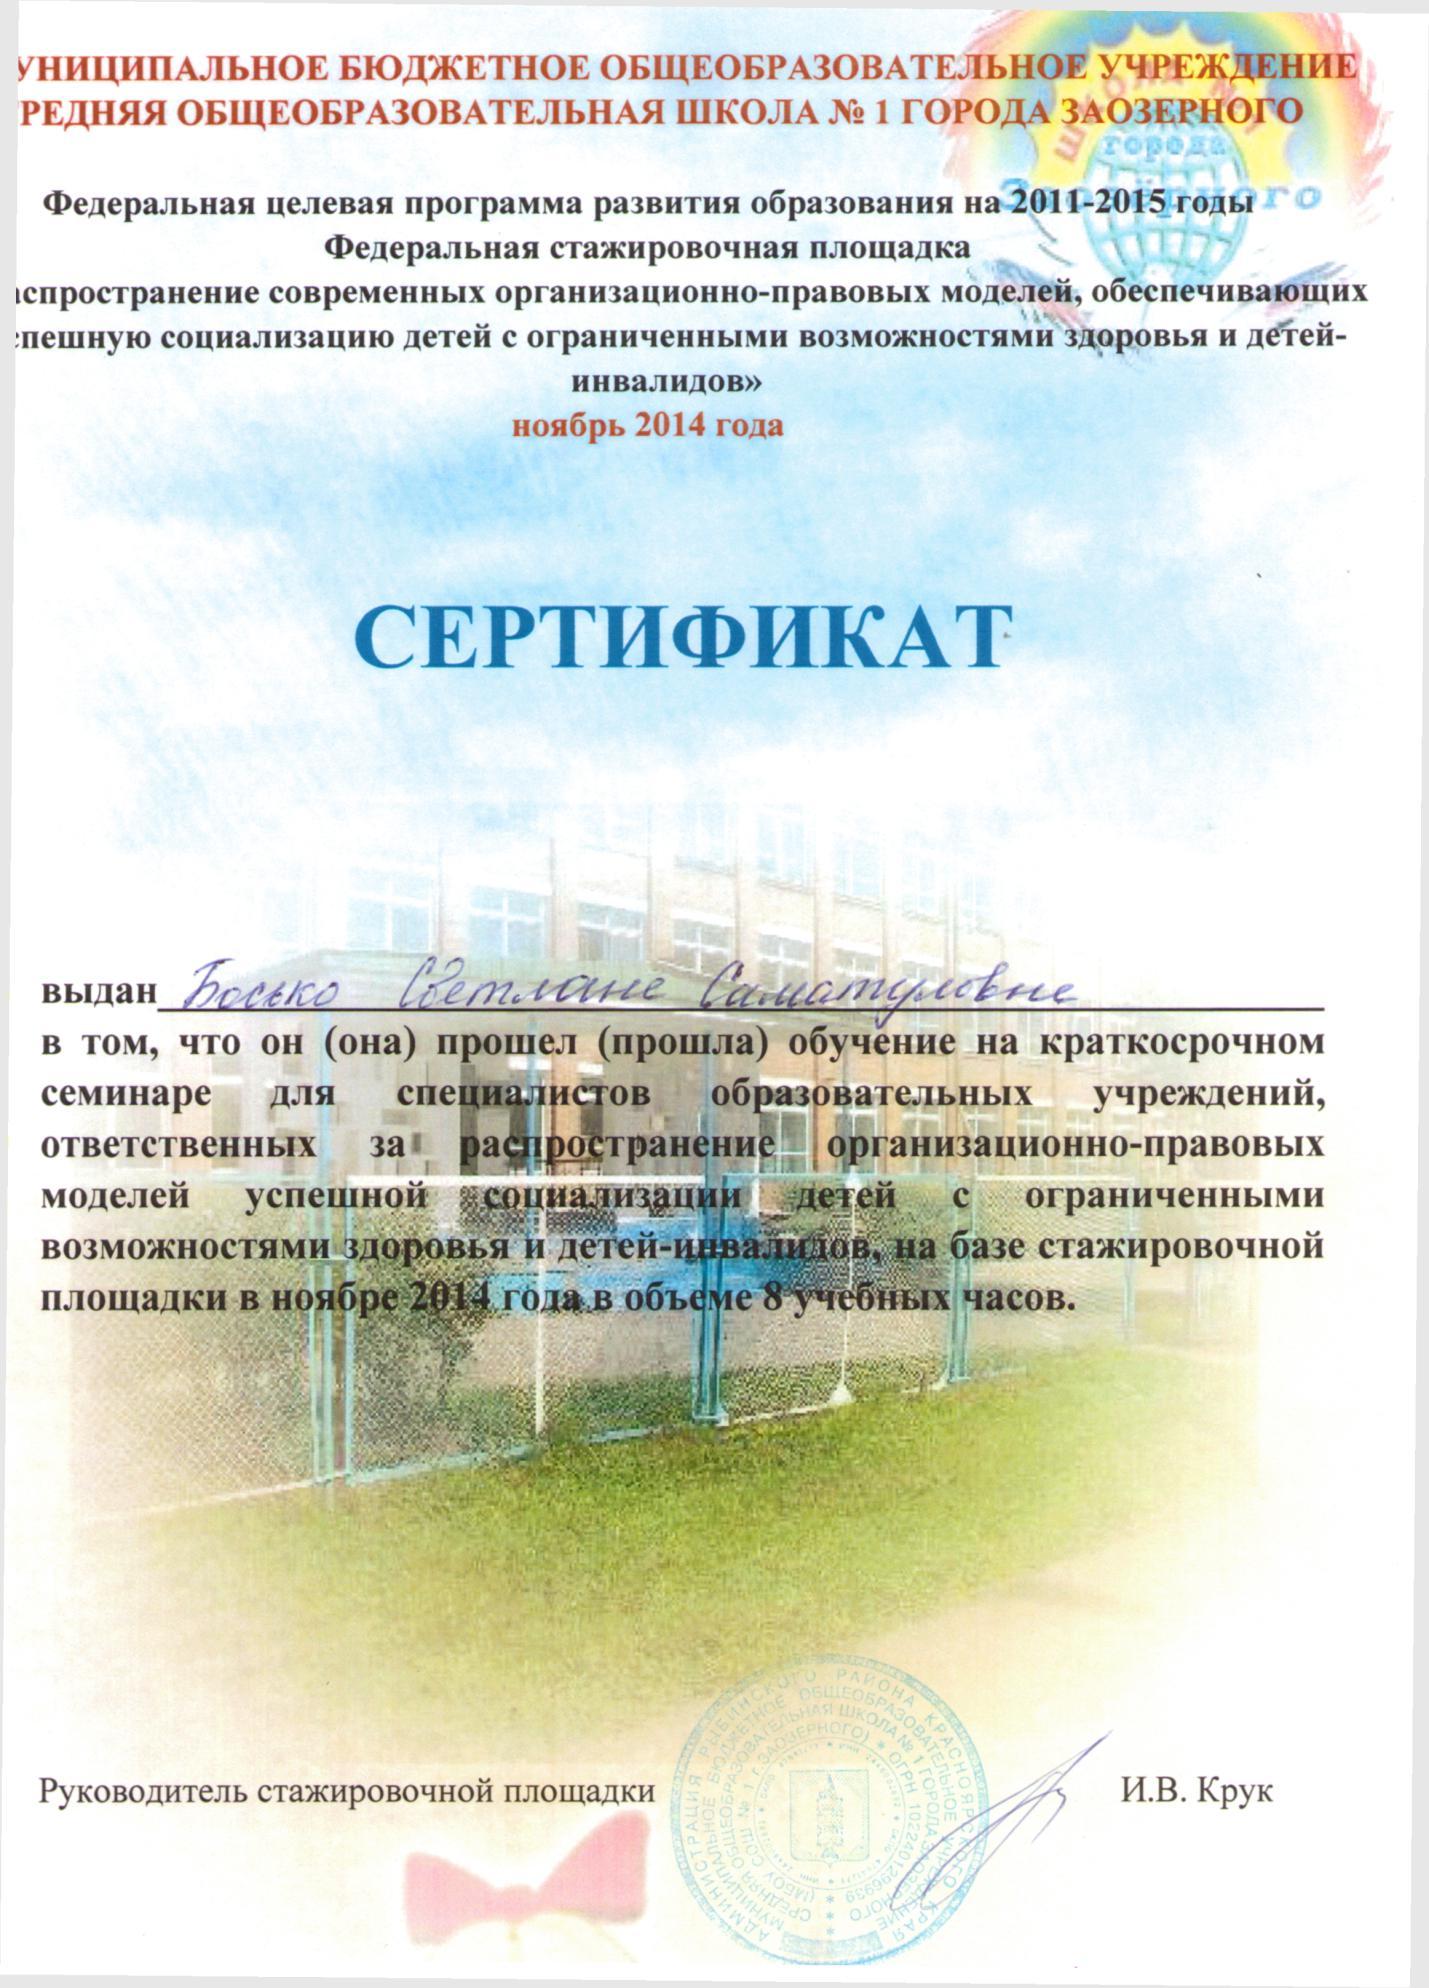 C:\Documents and Settings\Светлана Саматуловна\Рабочий стол\квалификация\14 сертиф.tif